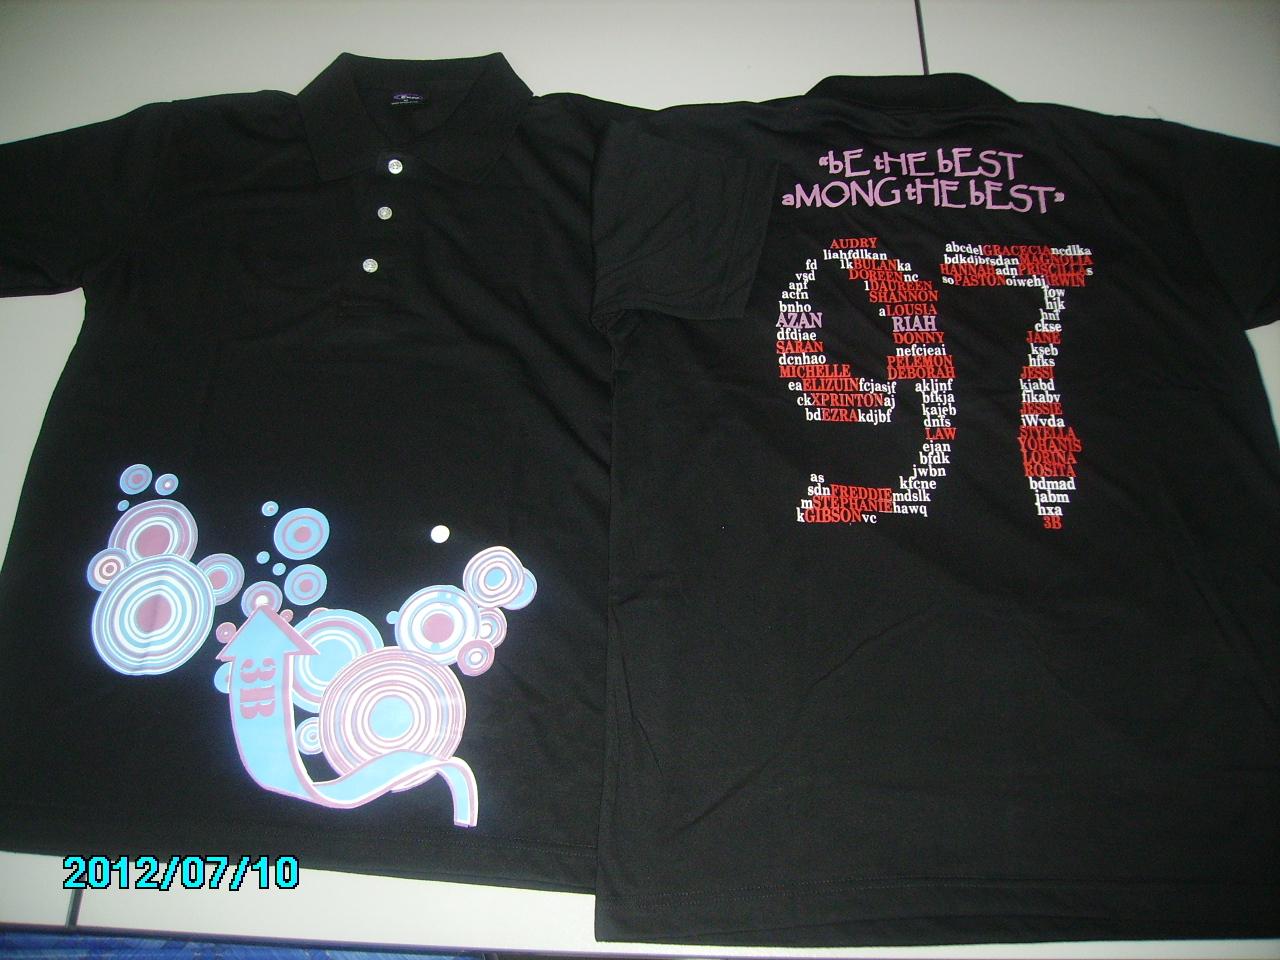 Design baju t shirt kelas - Cetak Baju Kelas